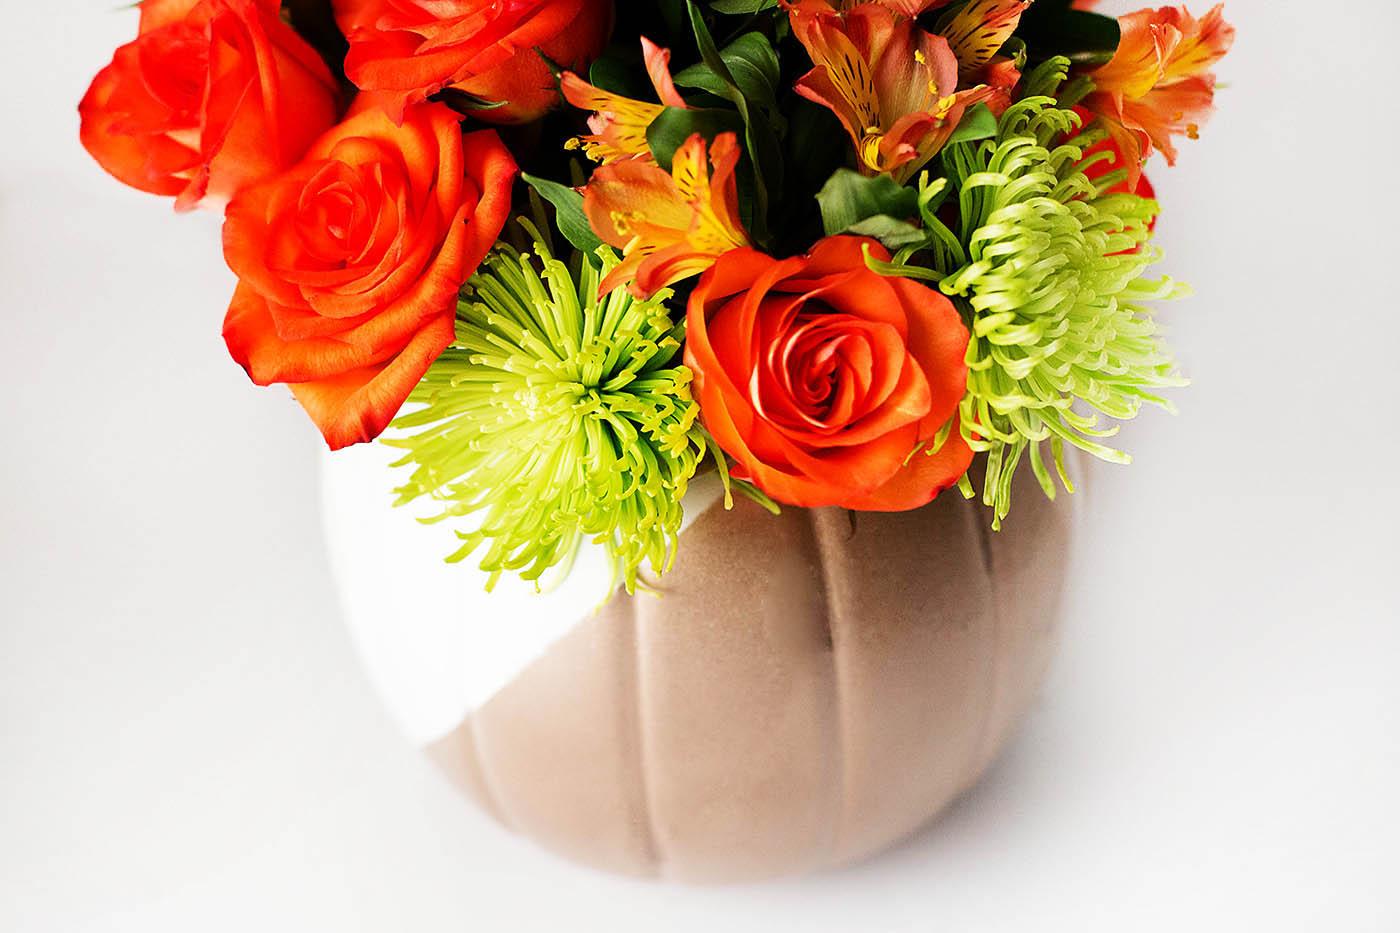 DIY pumpkin vase from a plastic pumpkin